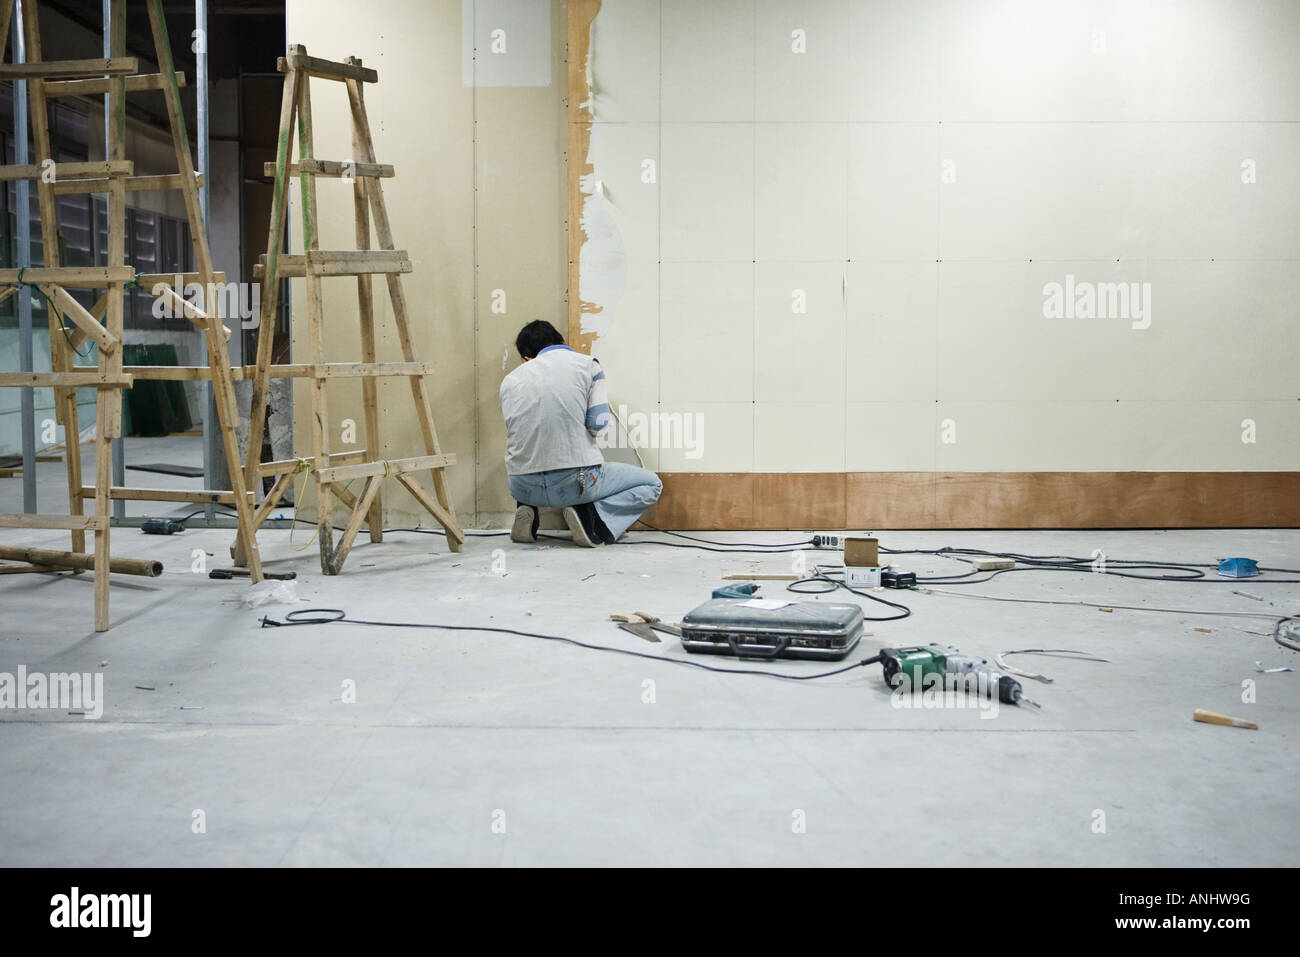 Man installing wallboard - Stock Image